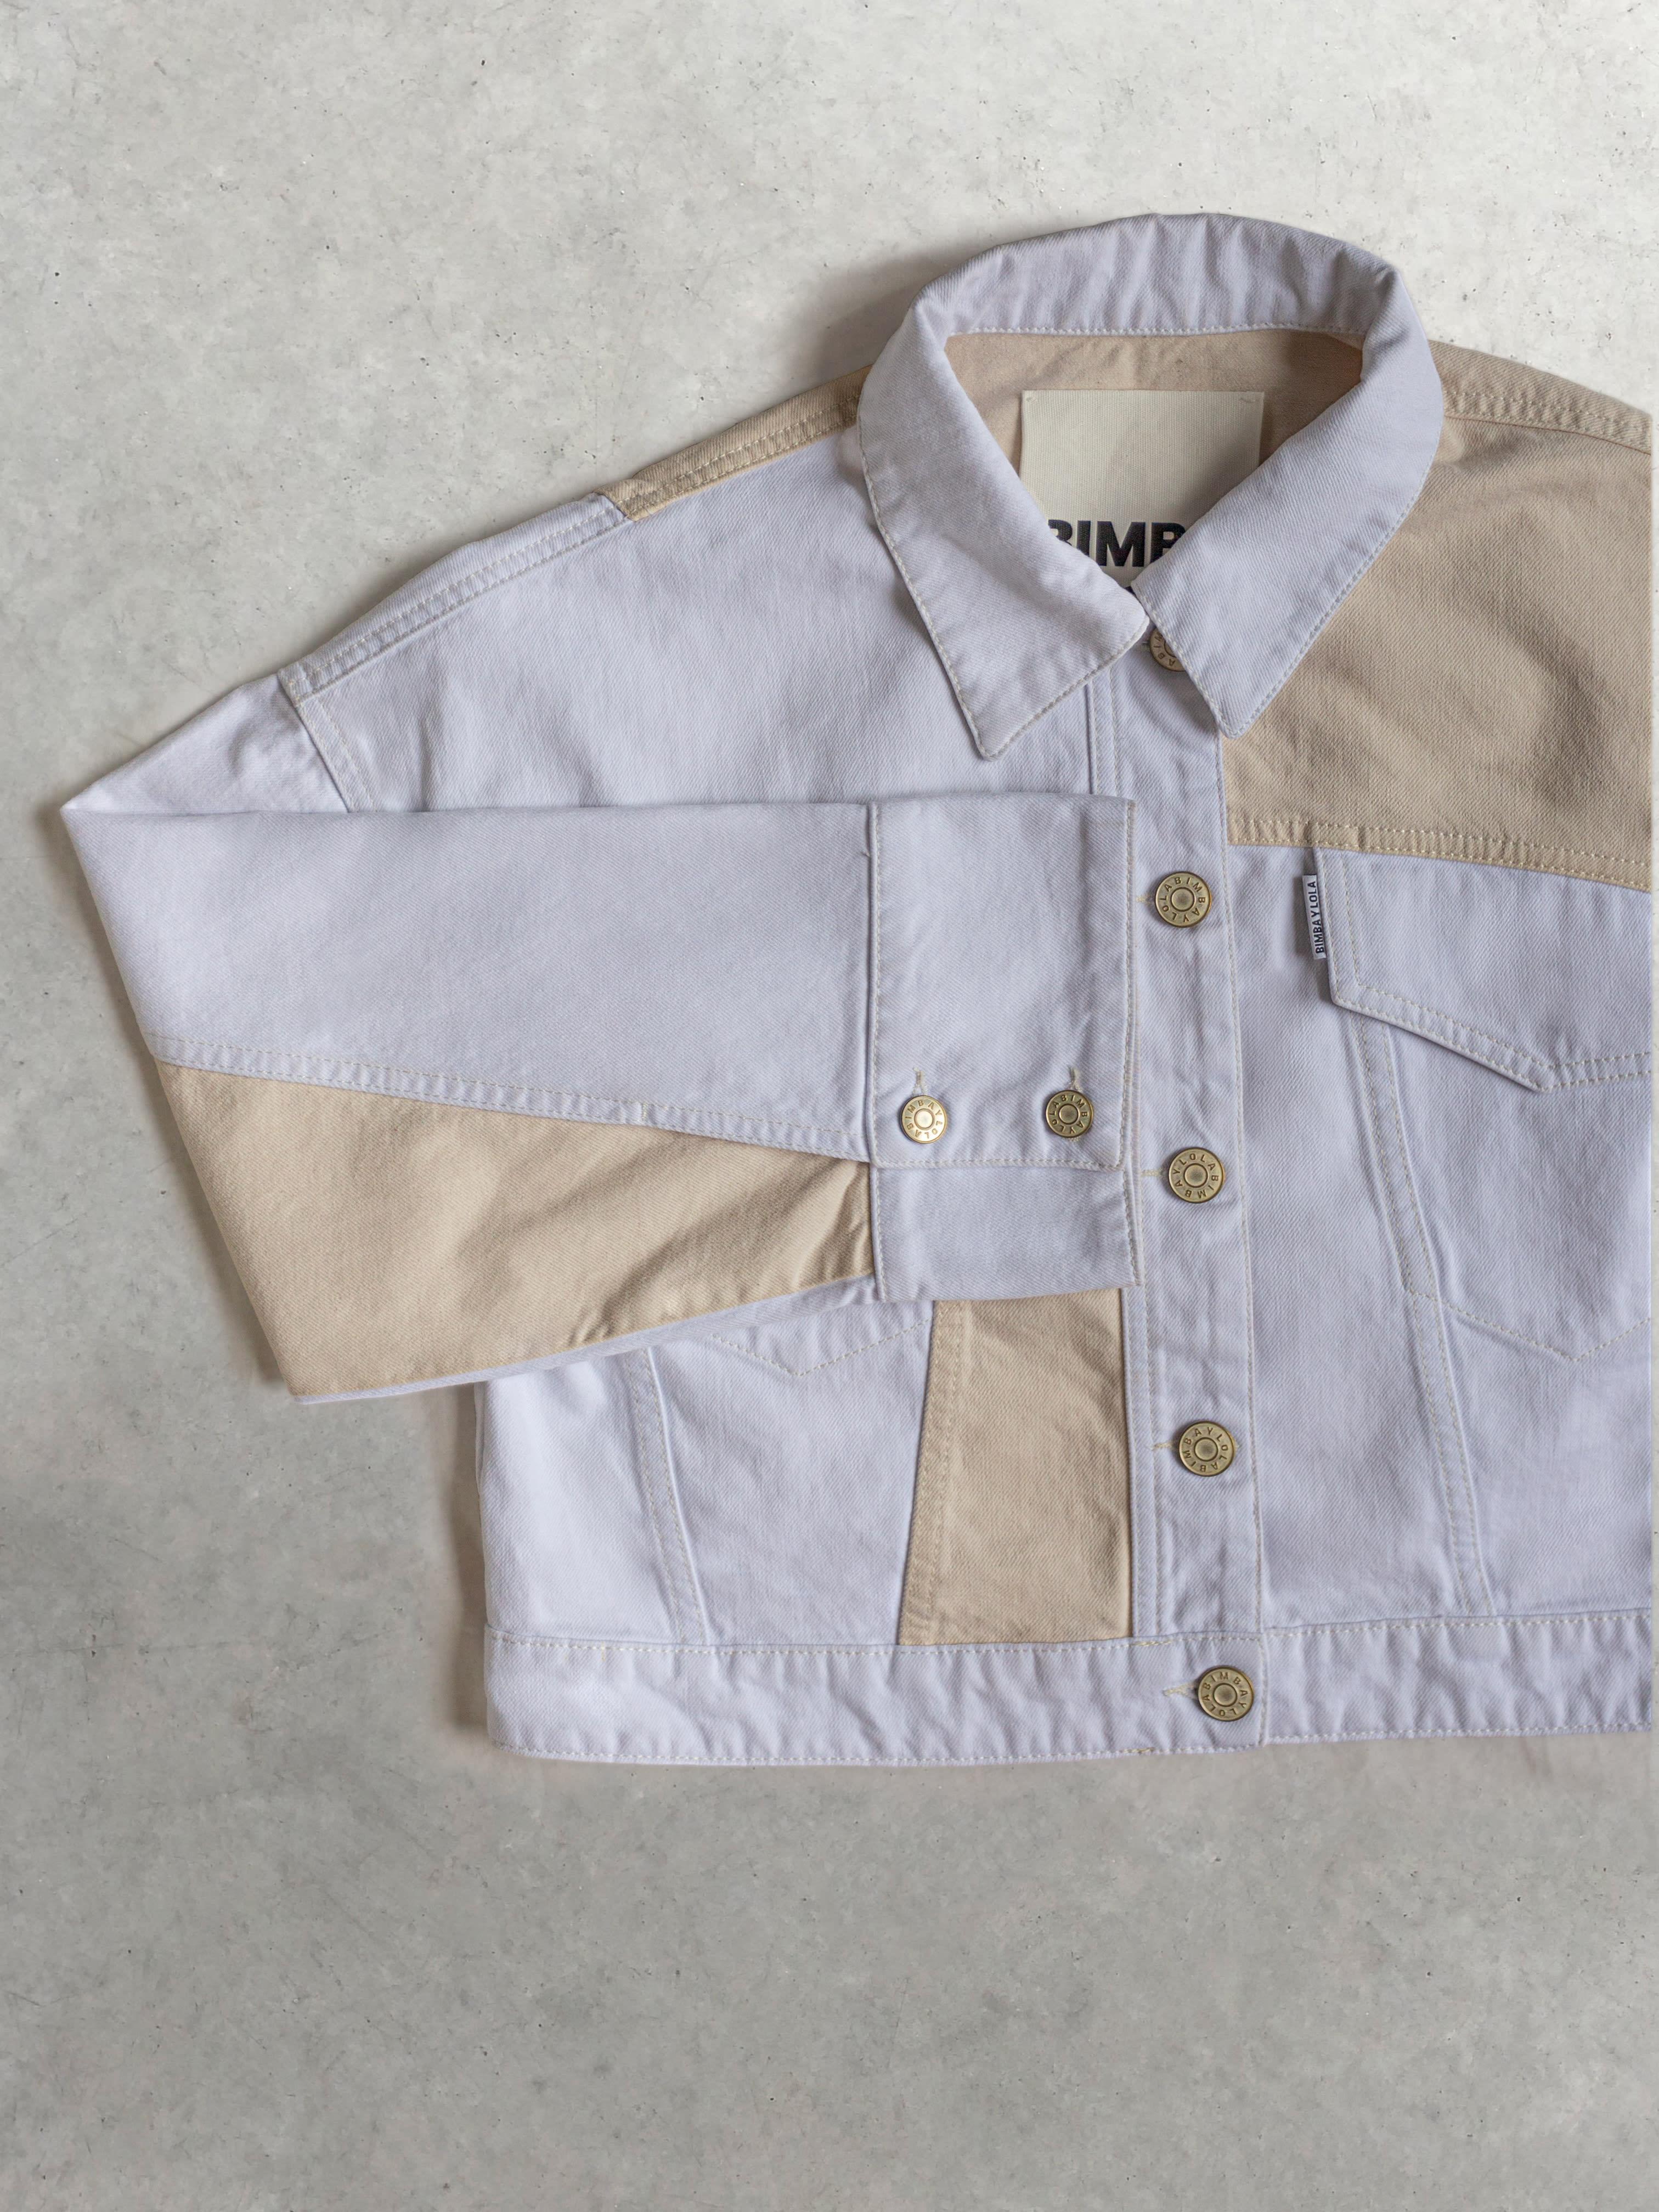 Packshot du produit Veste en jean blanc beige de la marque Bimba y Lola